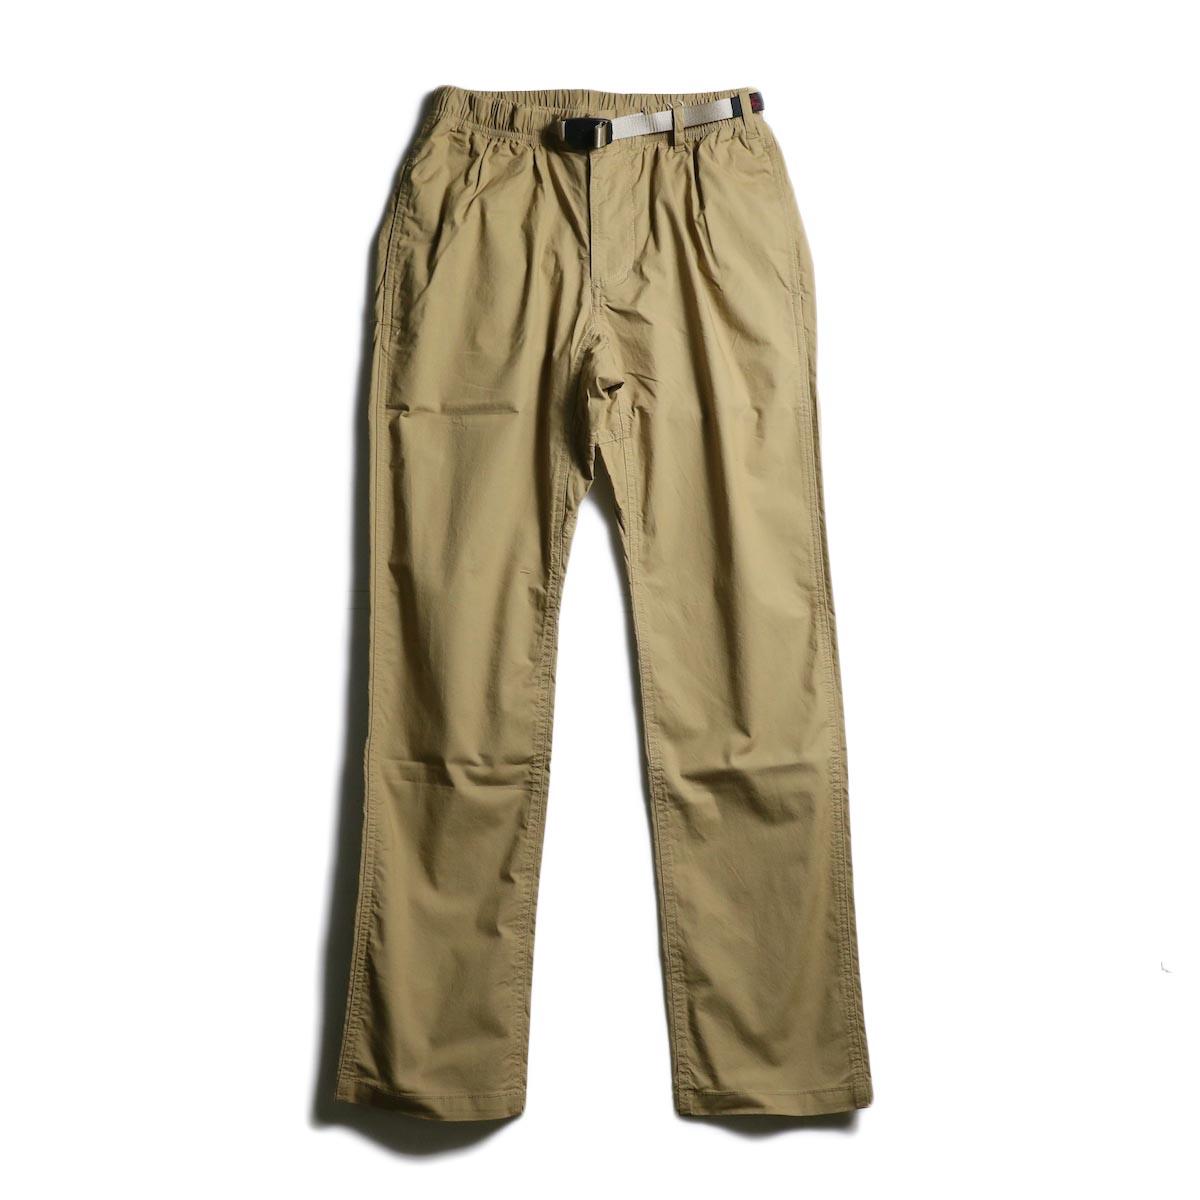 GRAMICCI / Weather NN-Pants Just Cut (Sand)